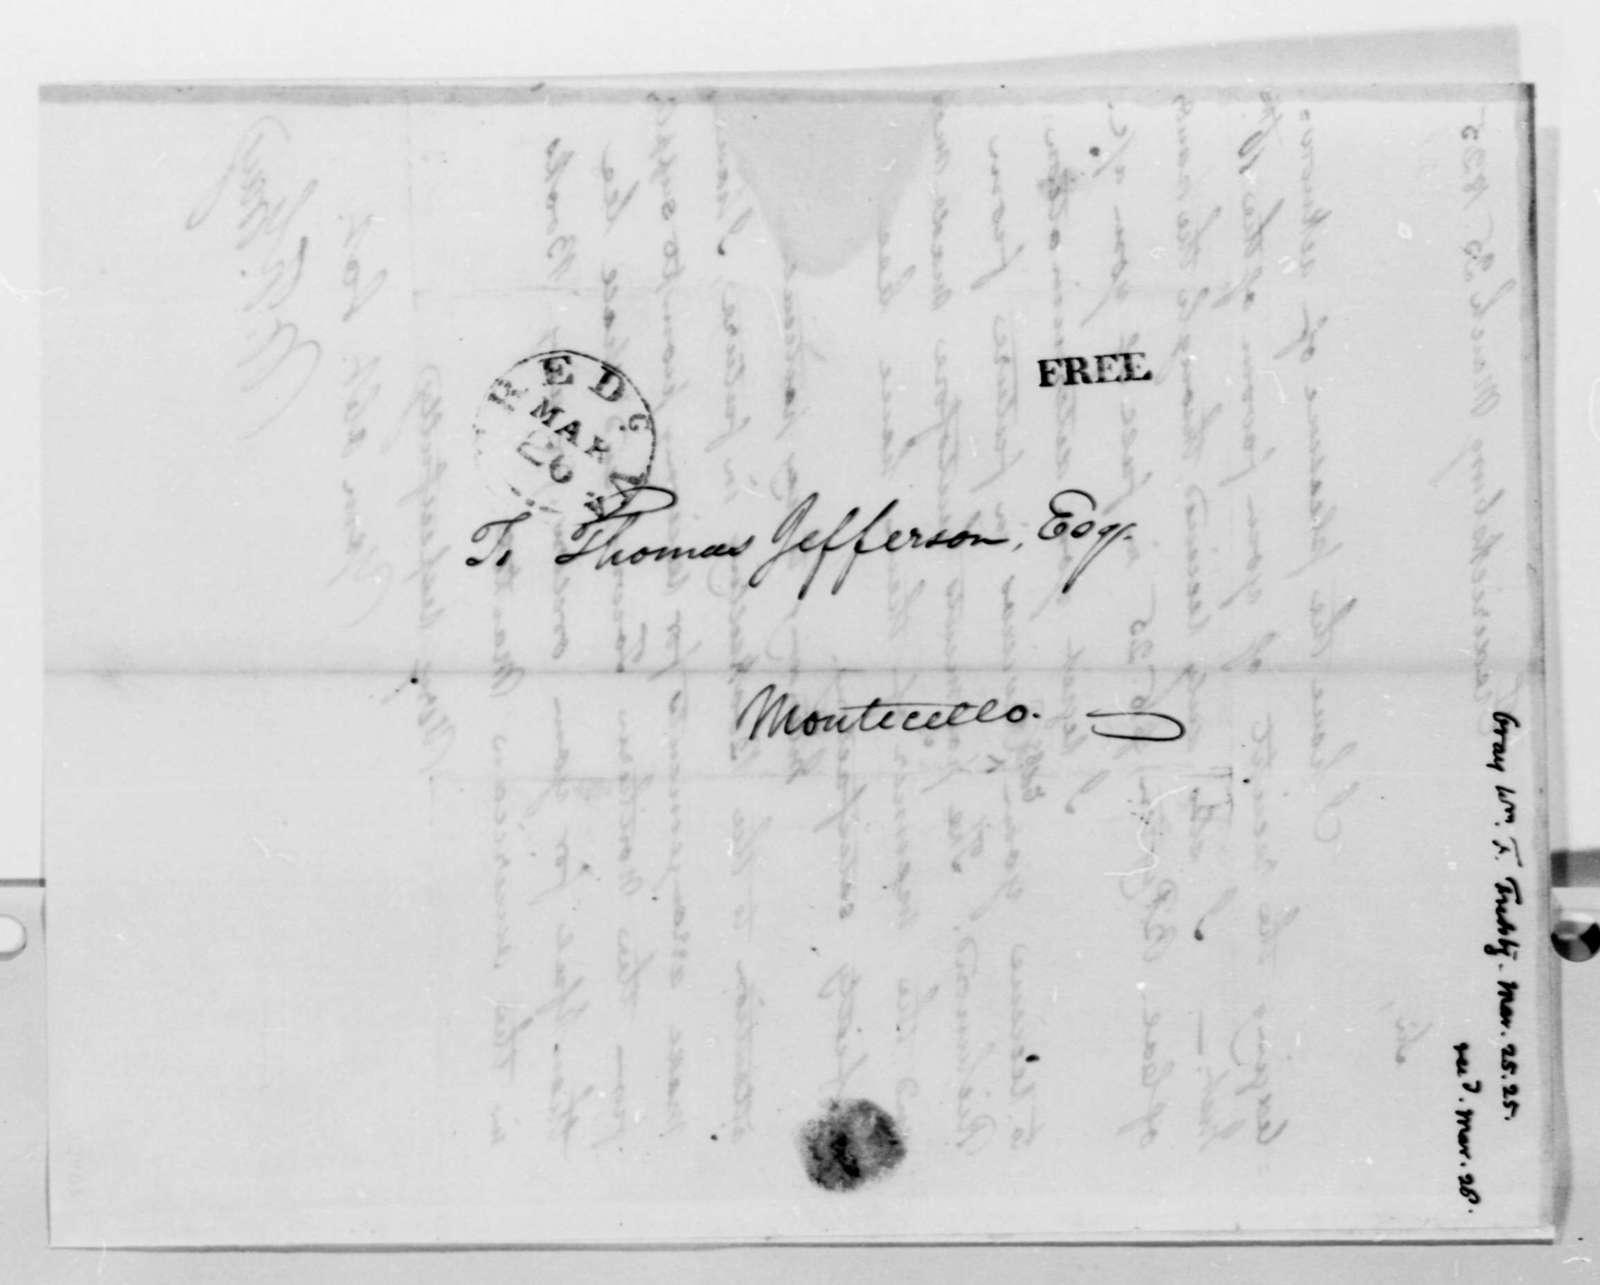 William F. Gray to Thomas Jefferson, March 25, 1825